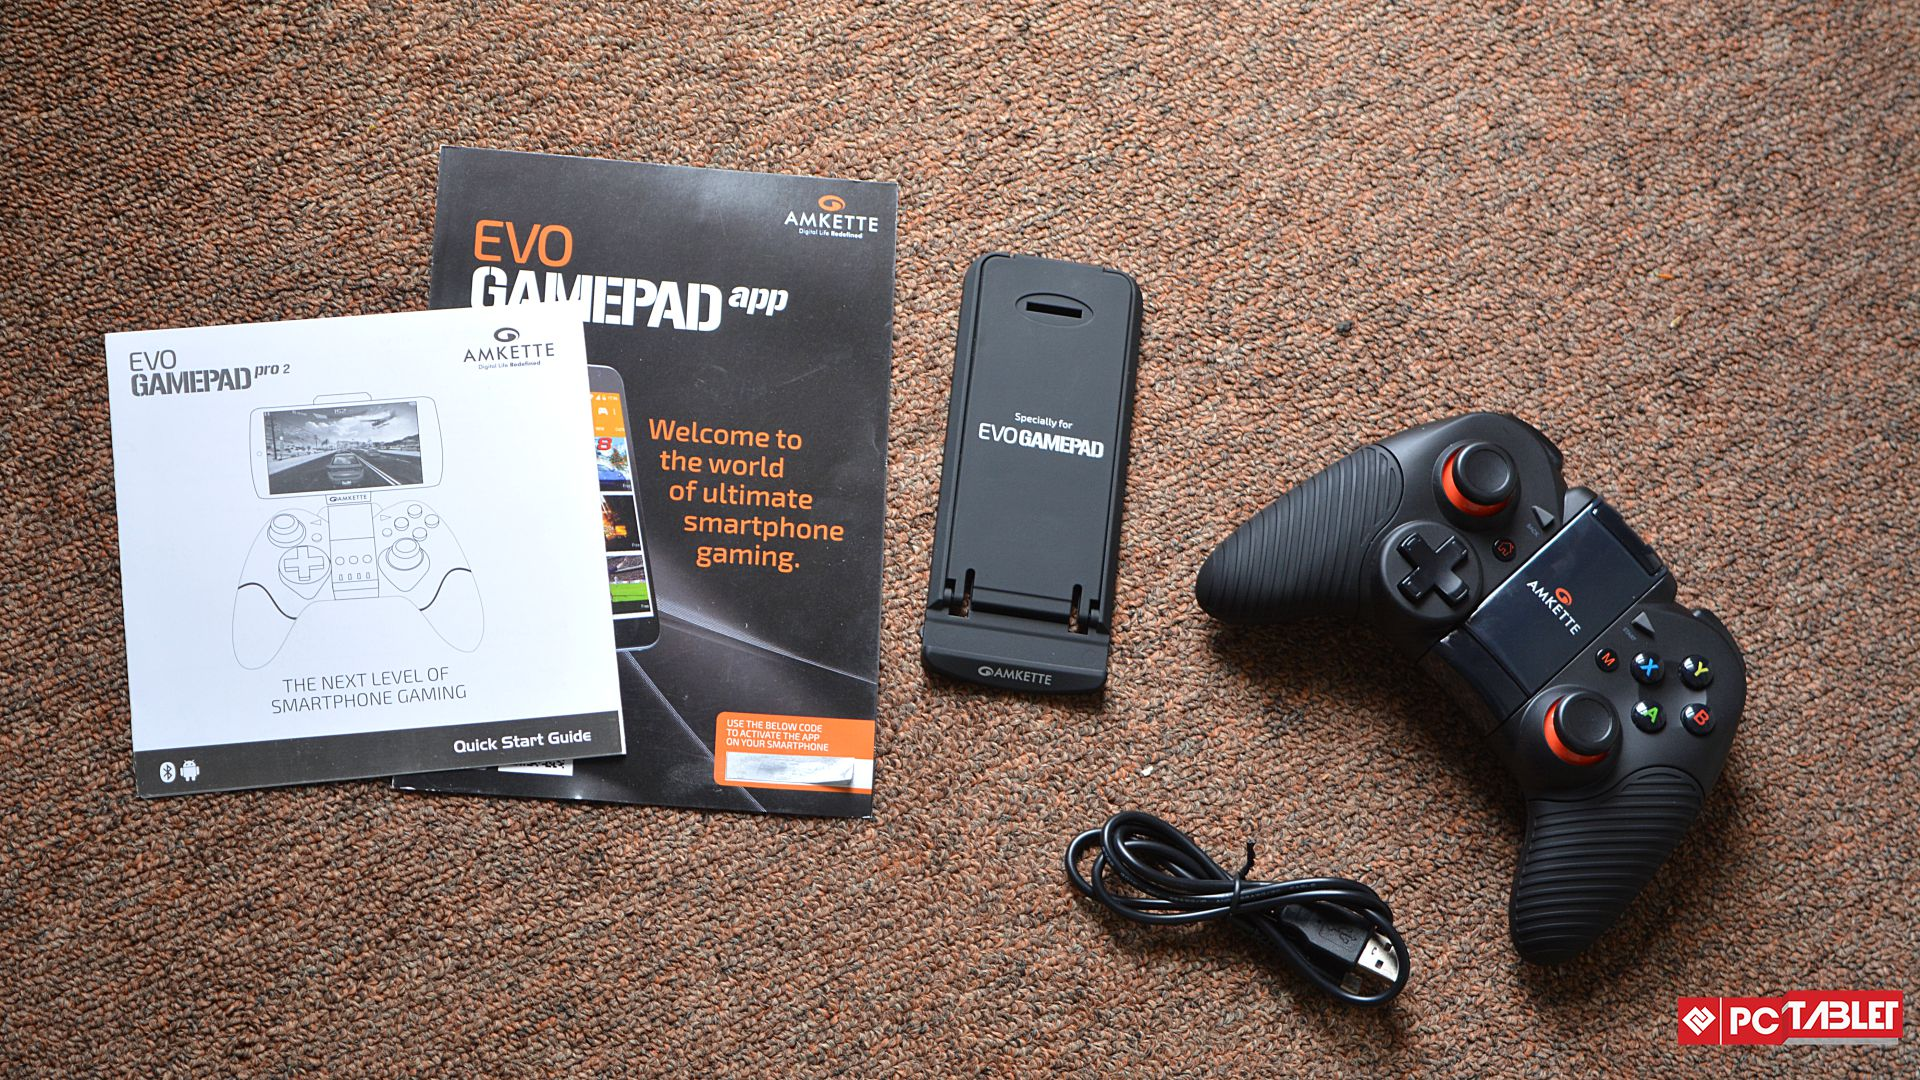 Amkette Evo Gamepad Pro 2 (6)